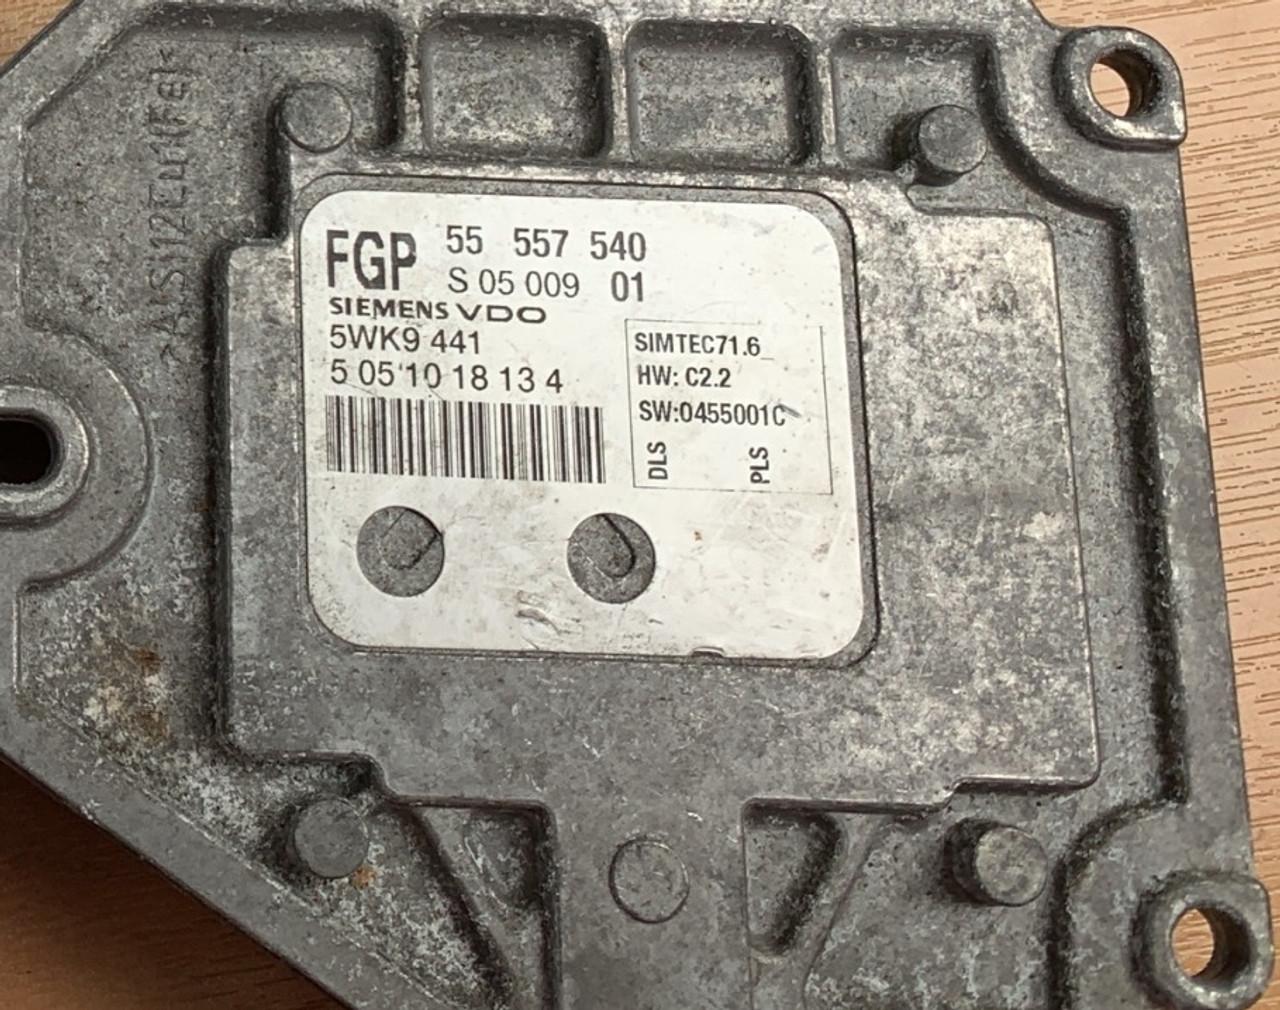 Vauxhall Opel, VECTRA C 1.8L, 55557540, 55 557 540, S0500901, S 05 009 01, 5WK9441, SIMTEC71.6